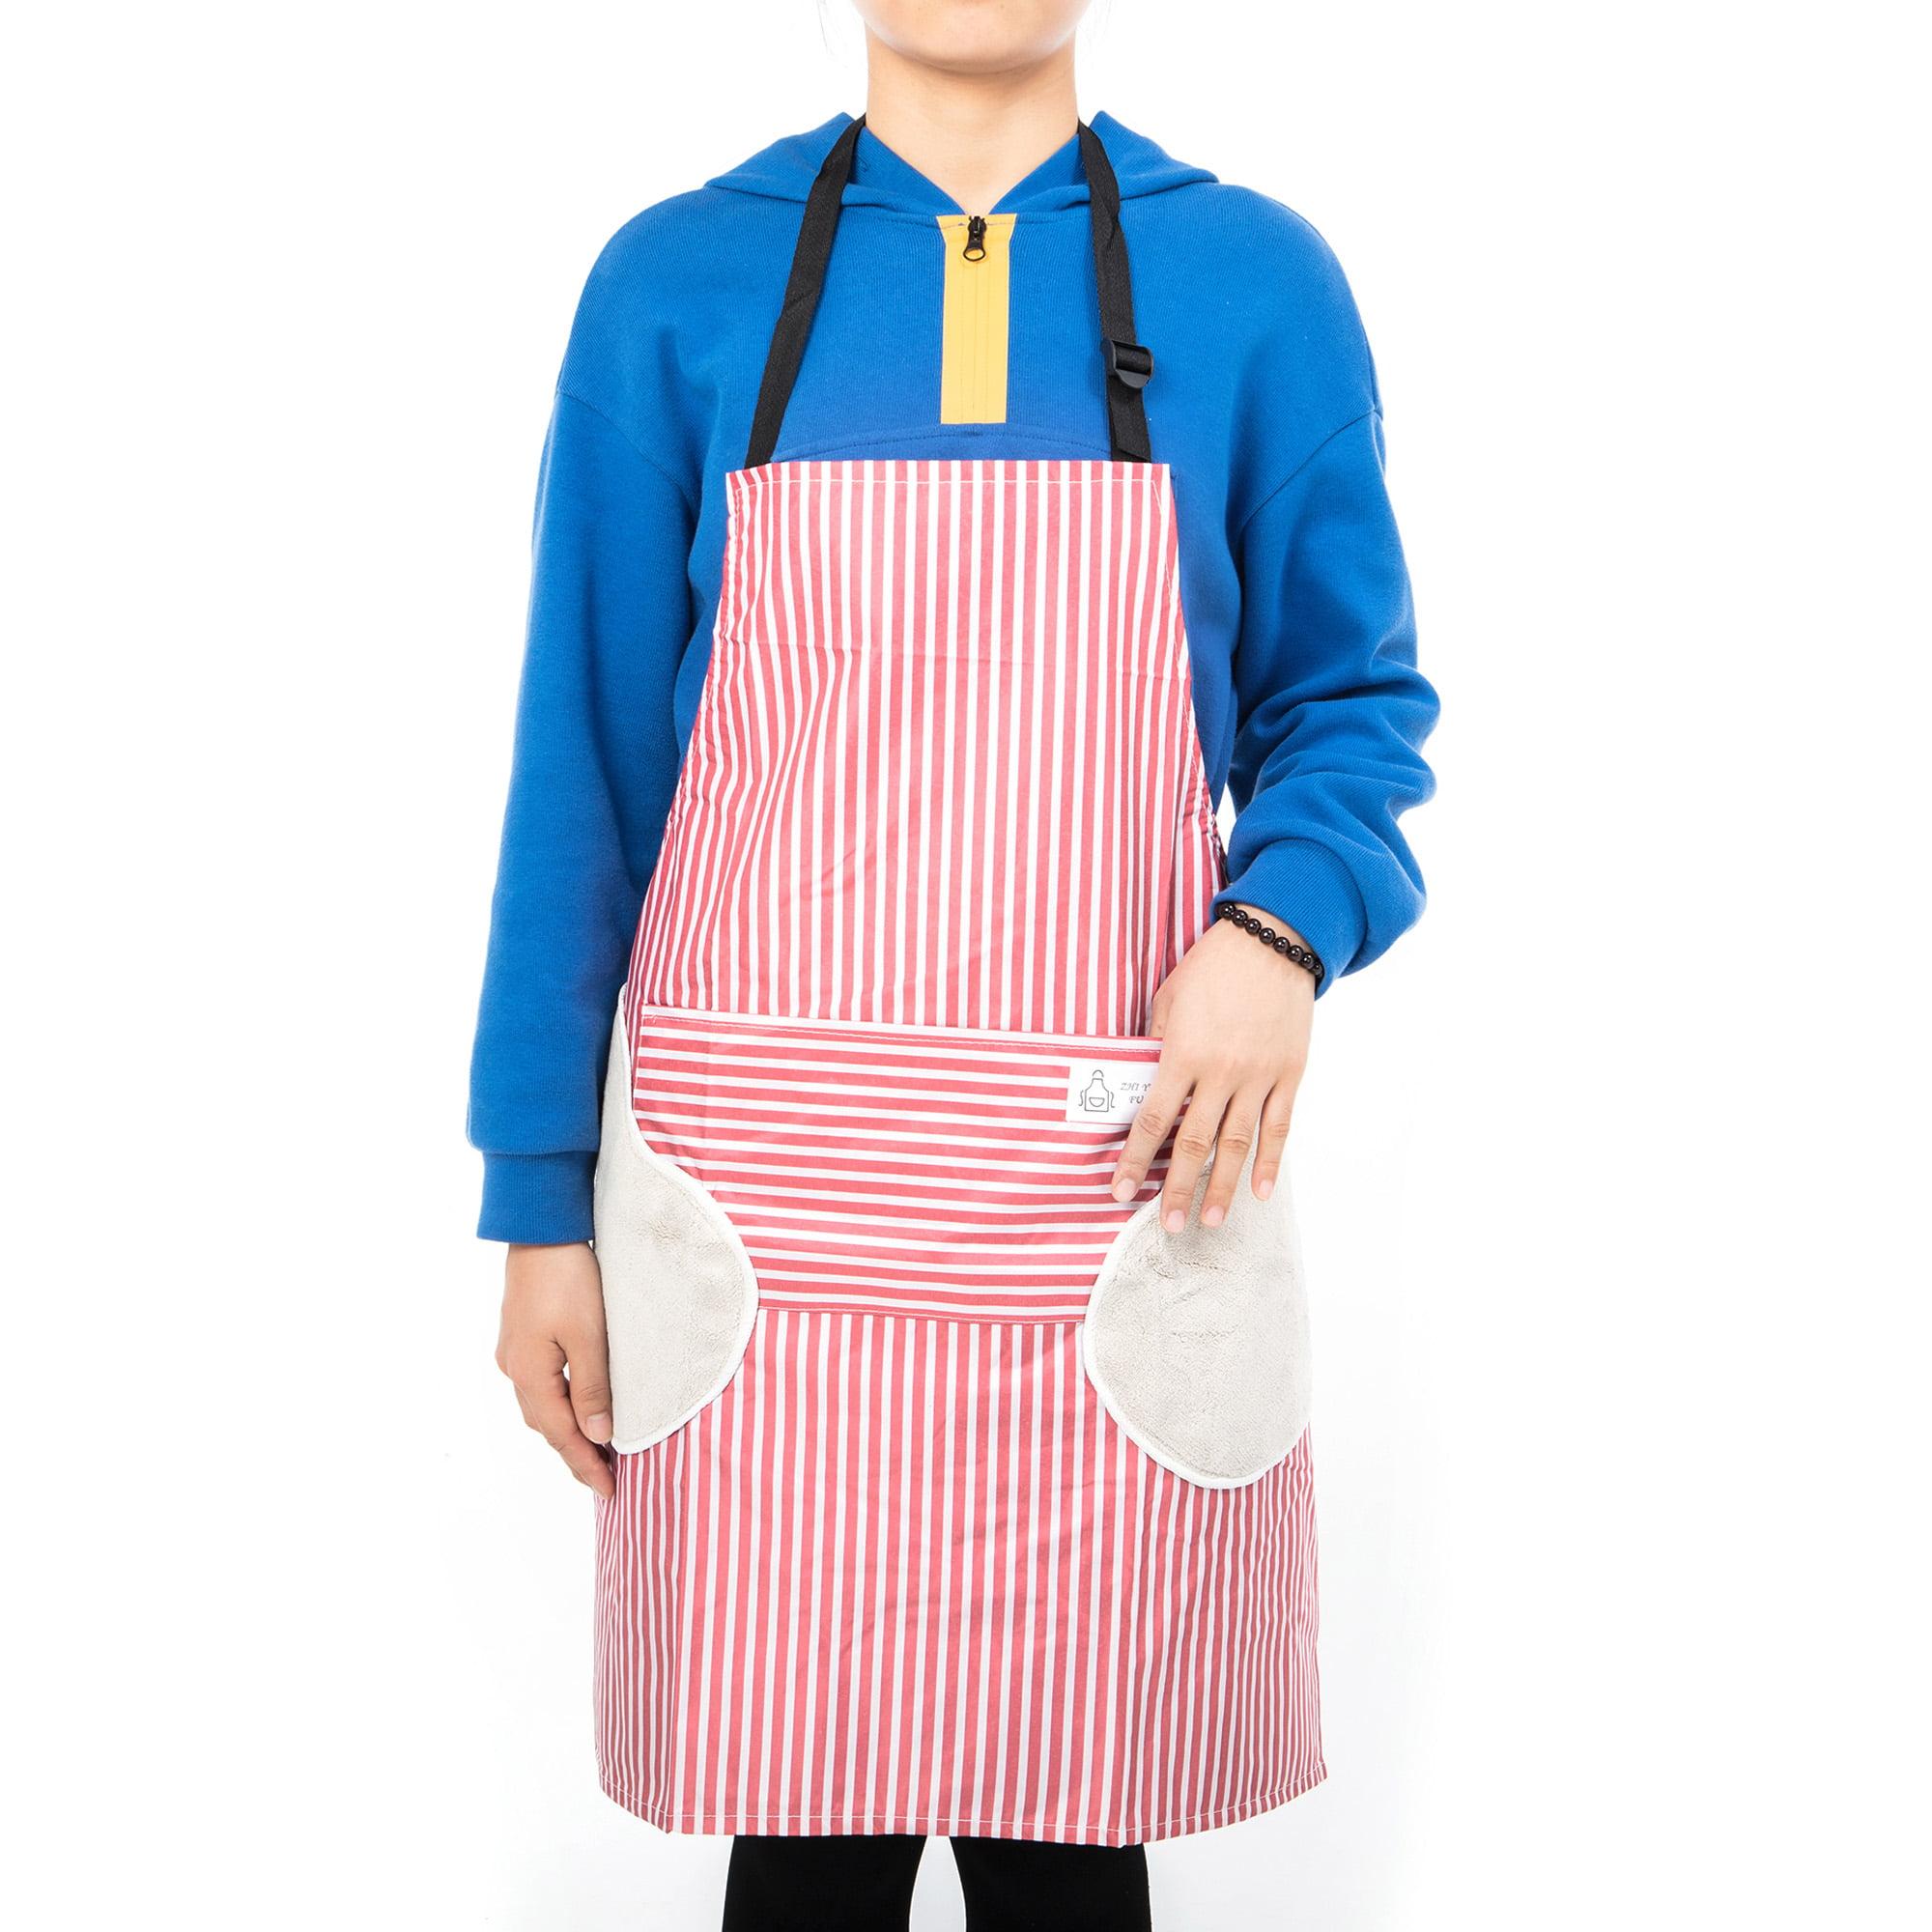 BBQ Baking Men /& Women Bib Apron for Cooking Crafting Machine Washable Work Shop Pink Transser Adjustable Kitchen Chef Apron with Pocket